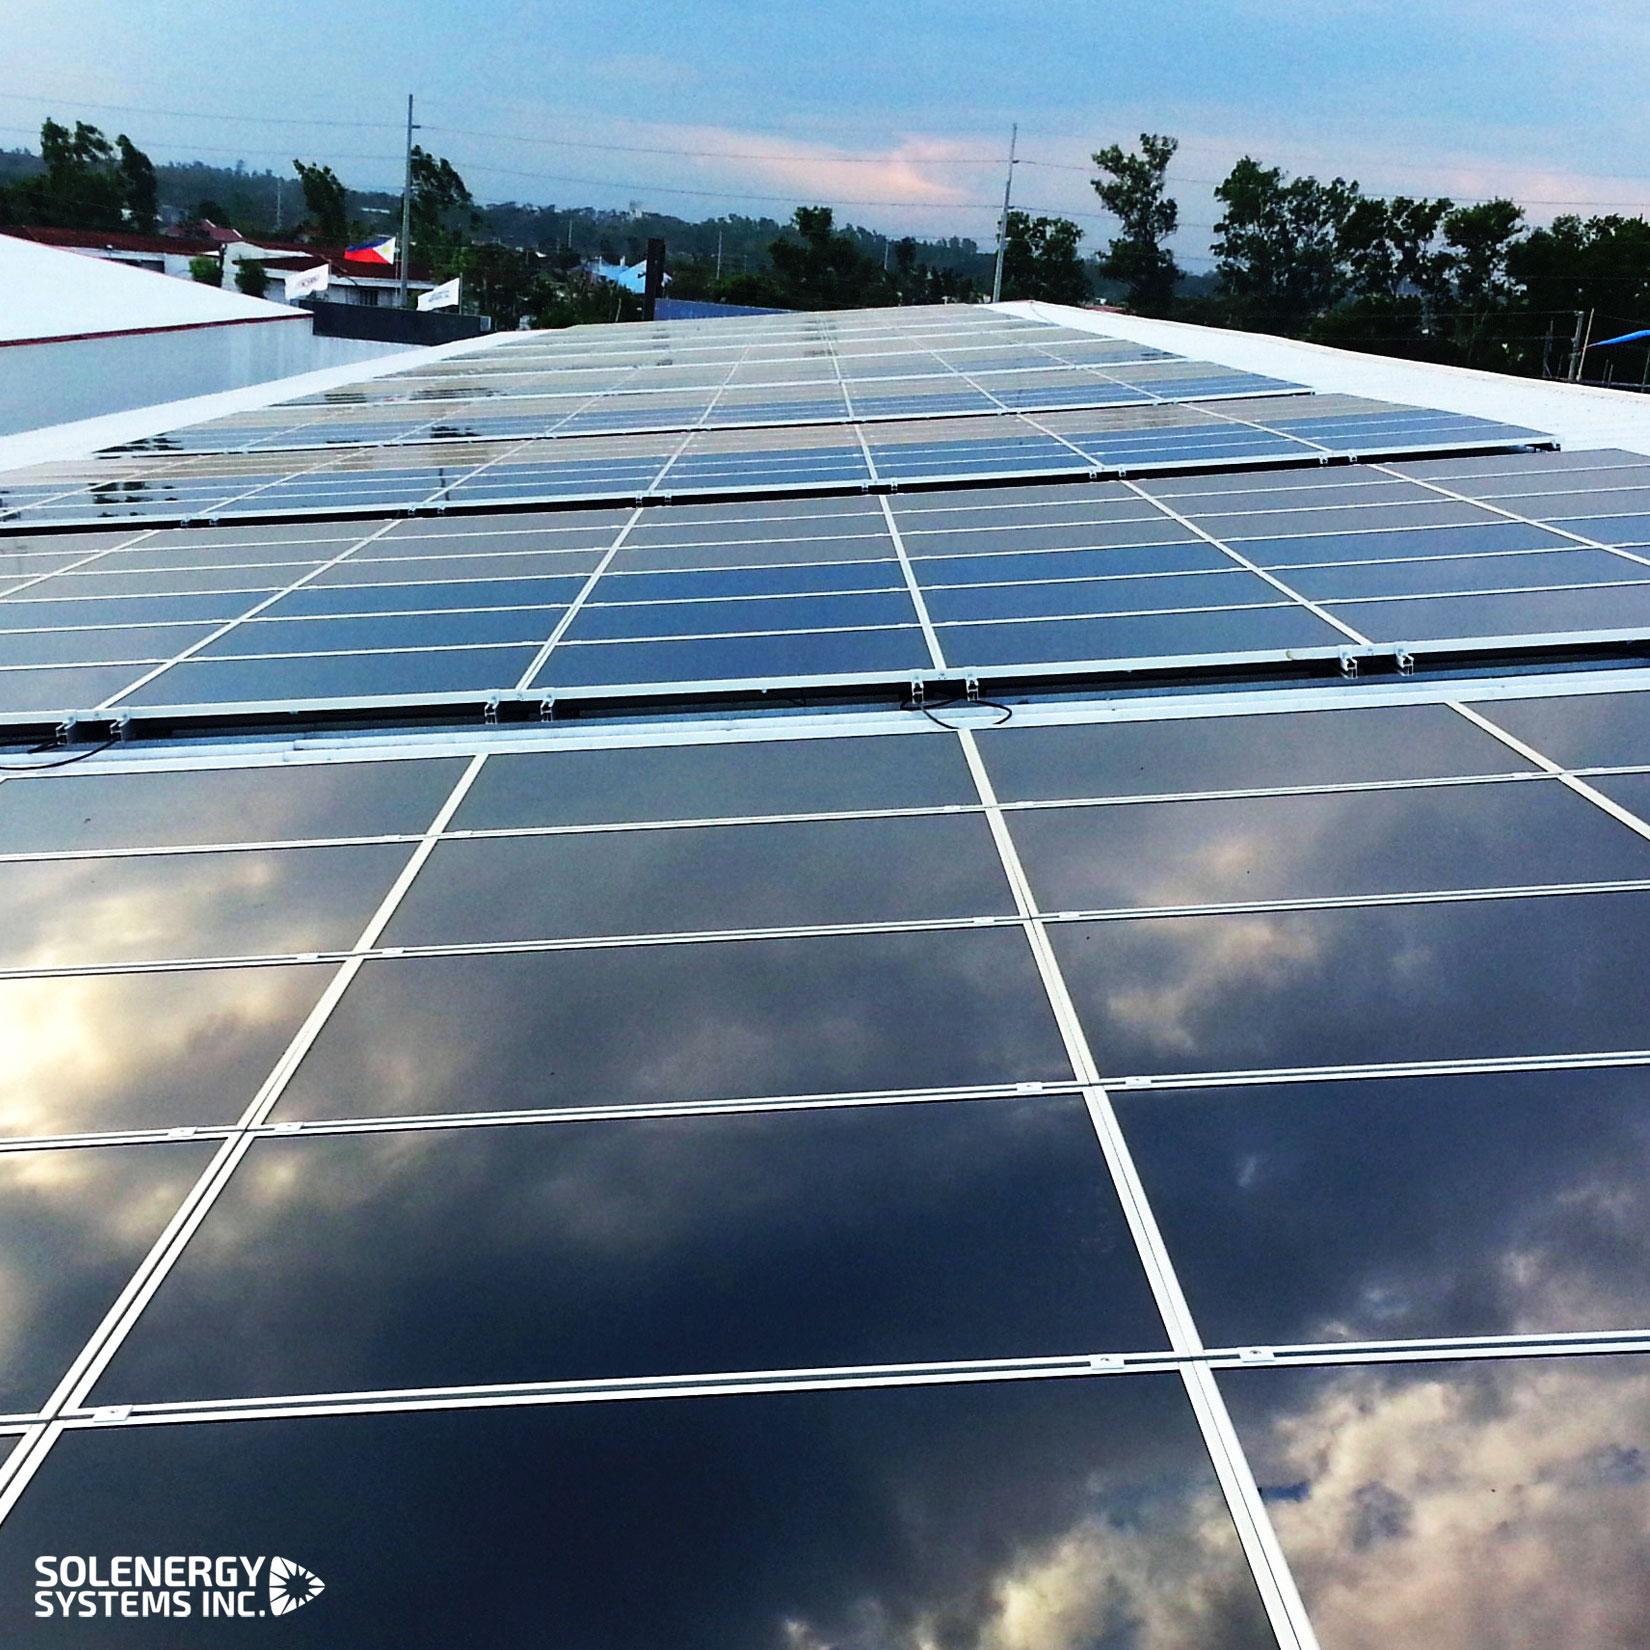 DuPont-Pioneer-Solenergy